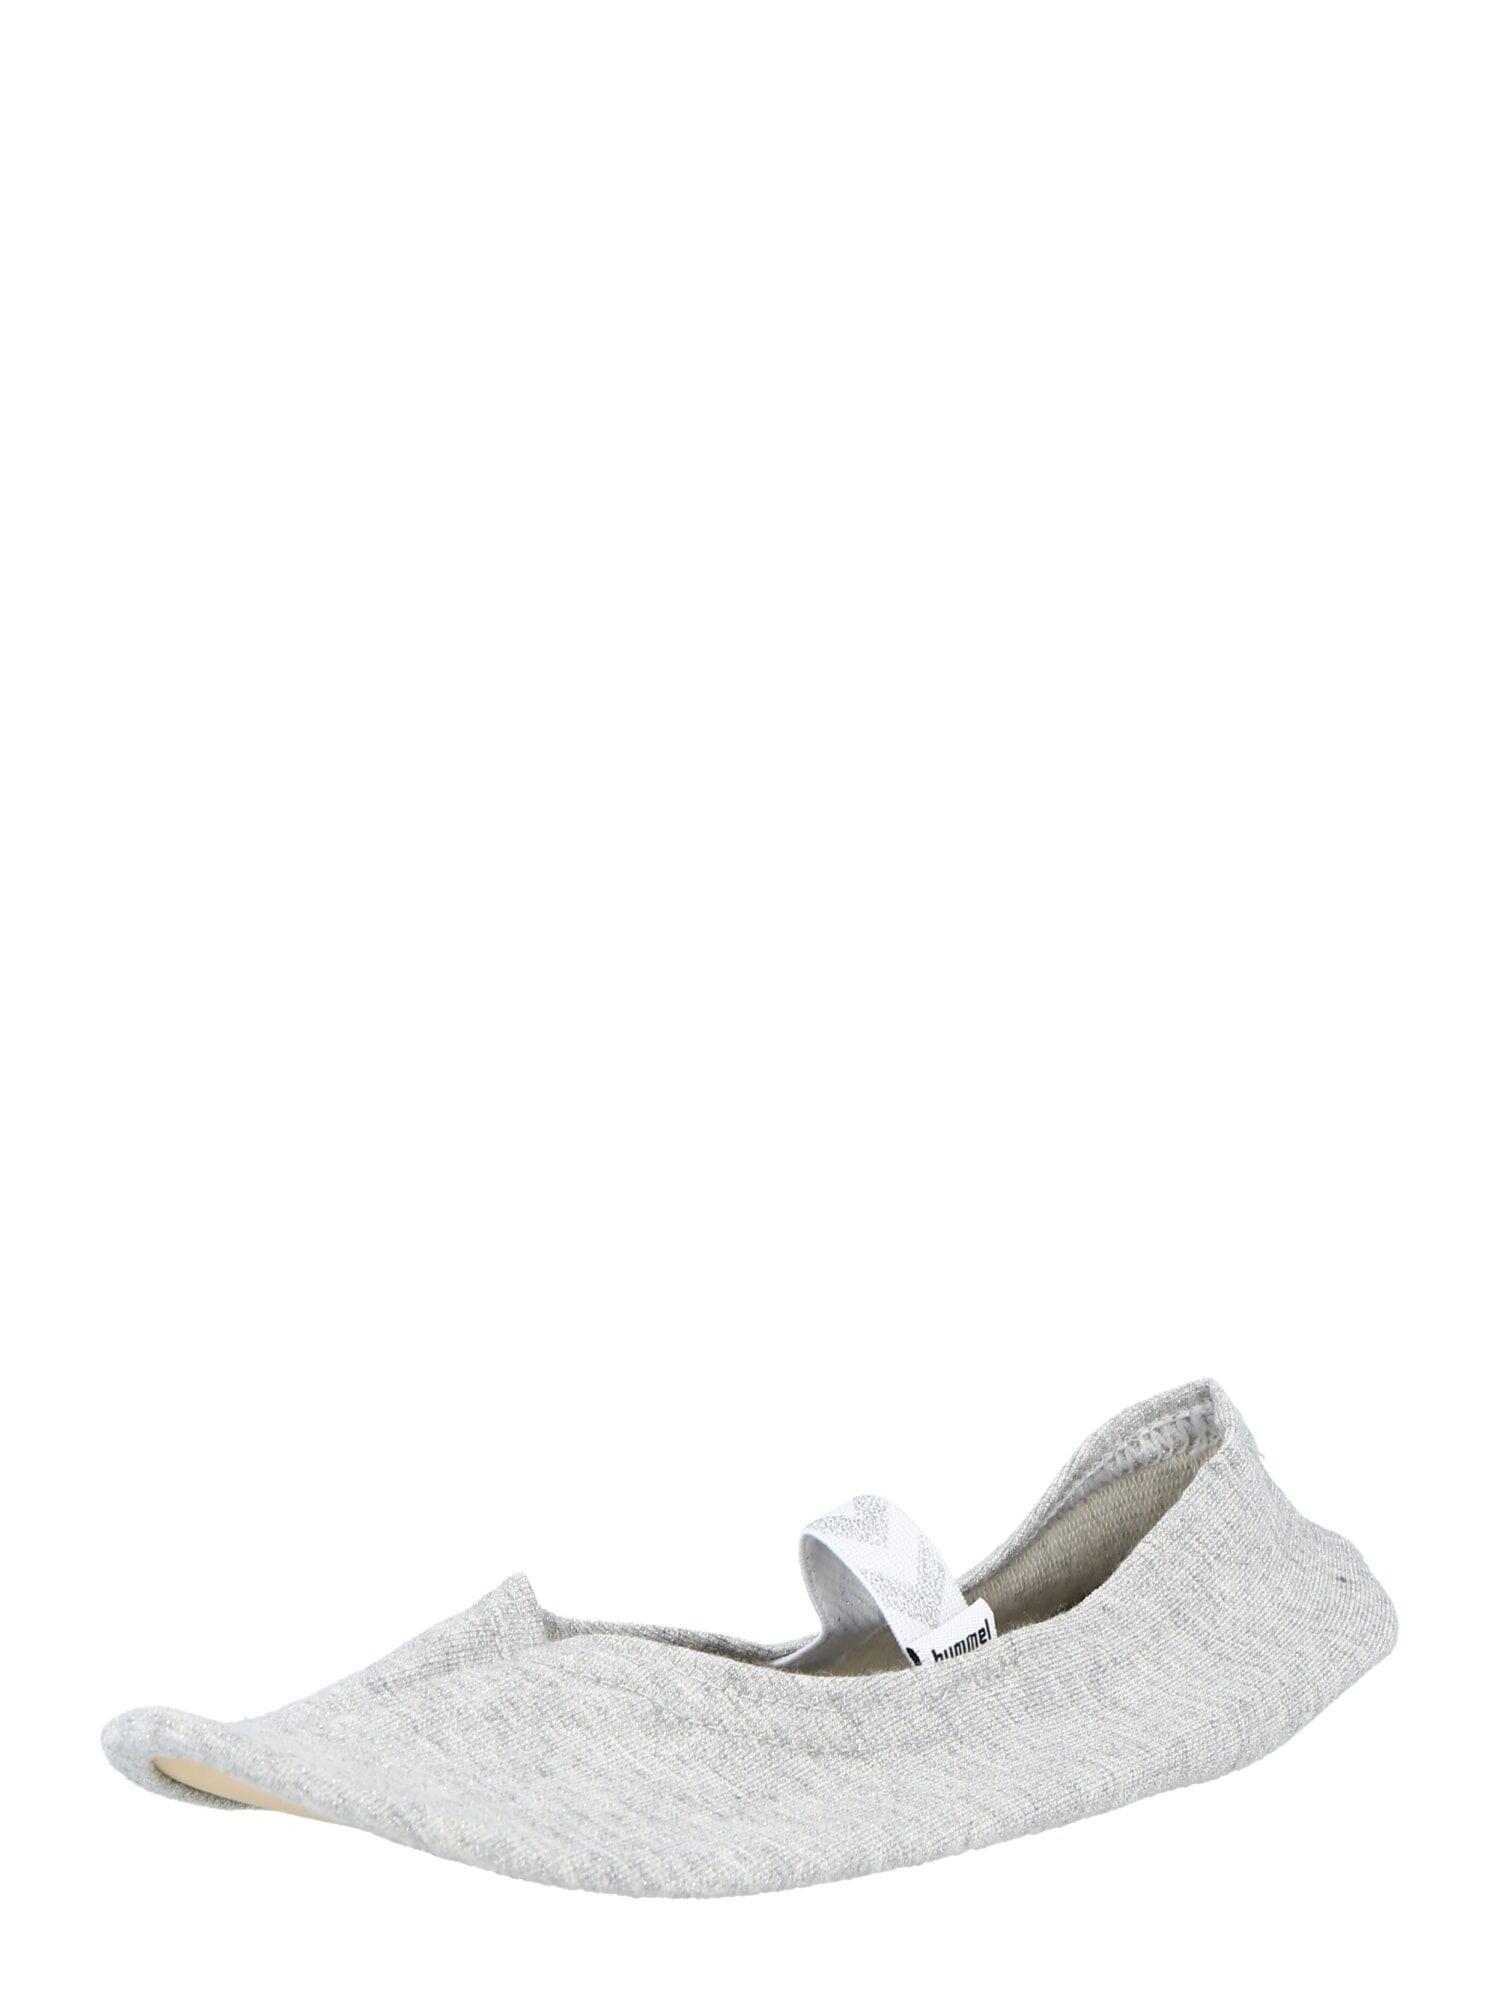 Hummel Chaussure de sport  - Gris - Taille: 28 - boy